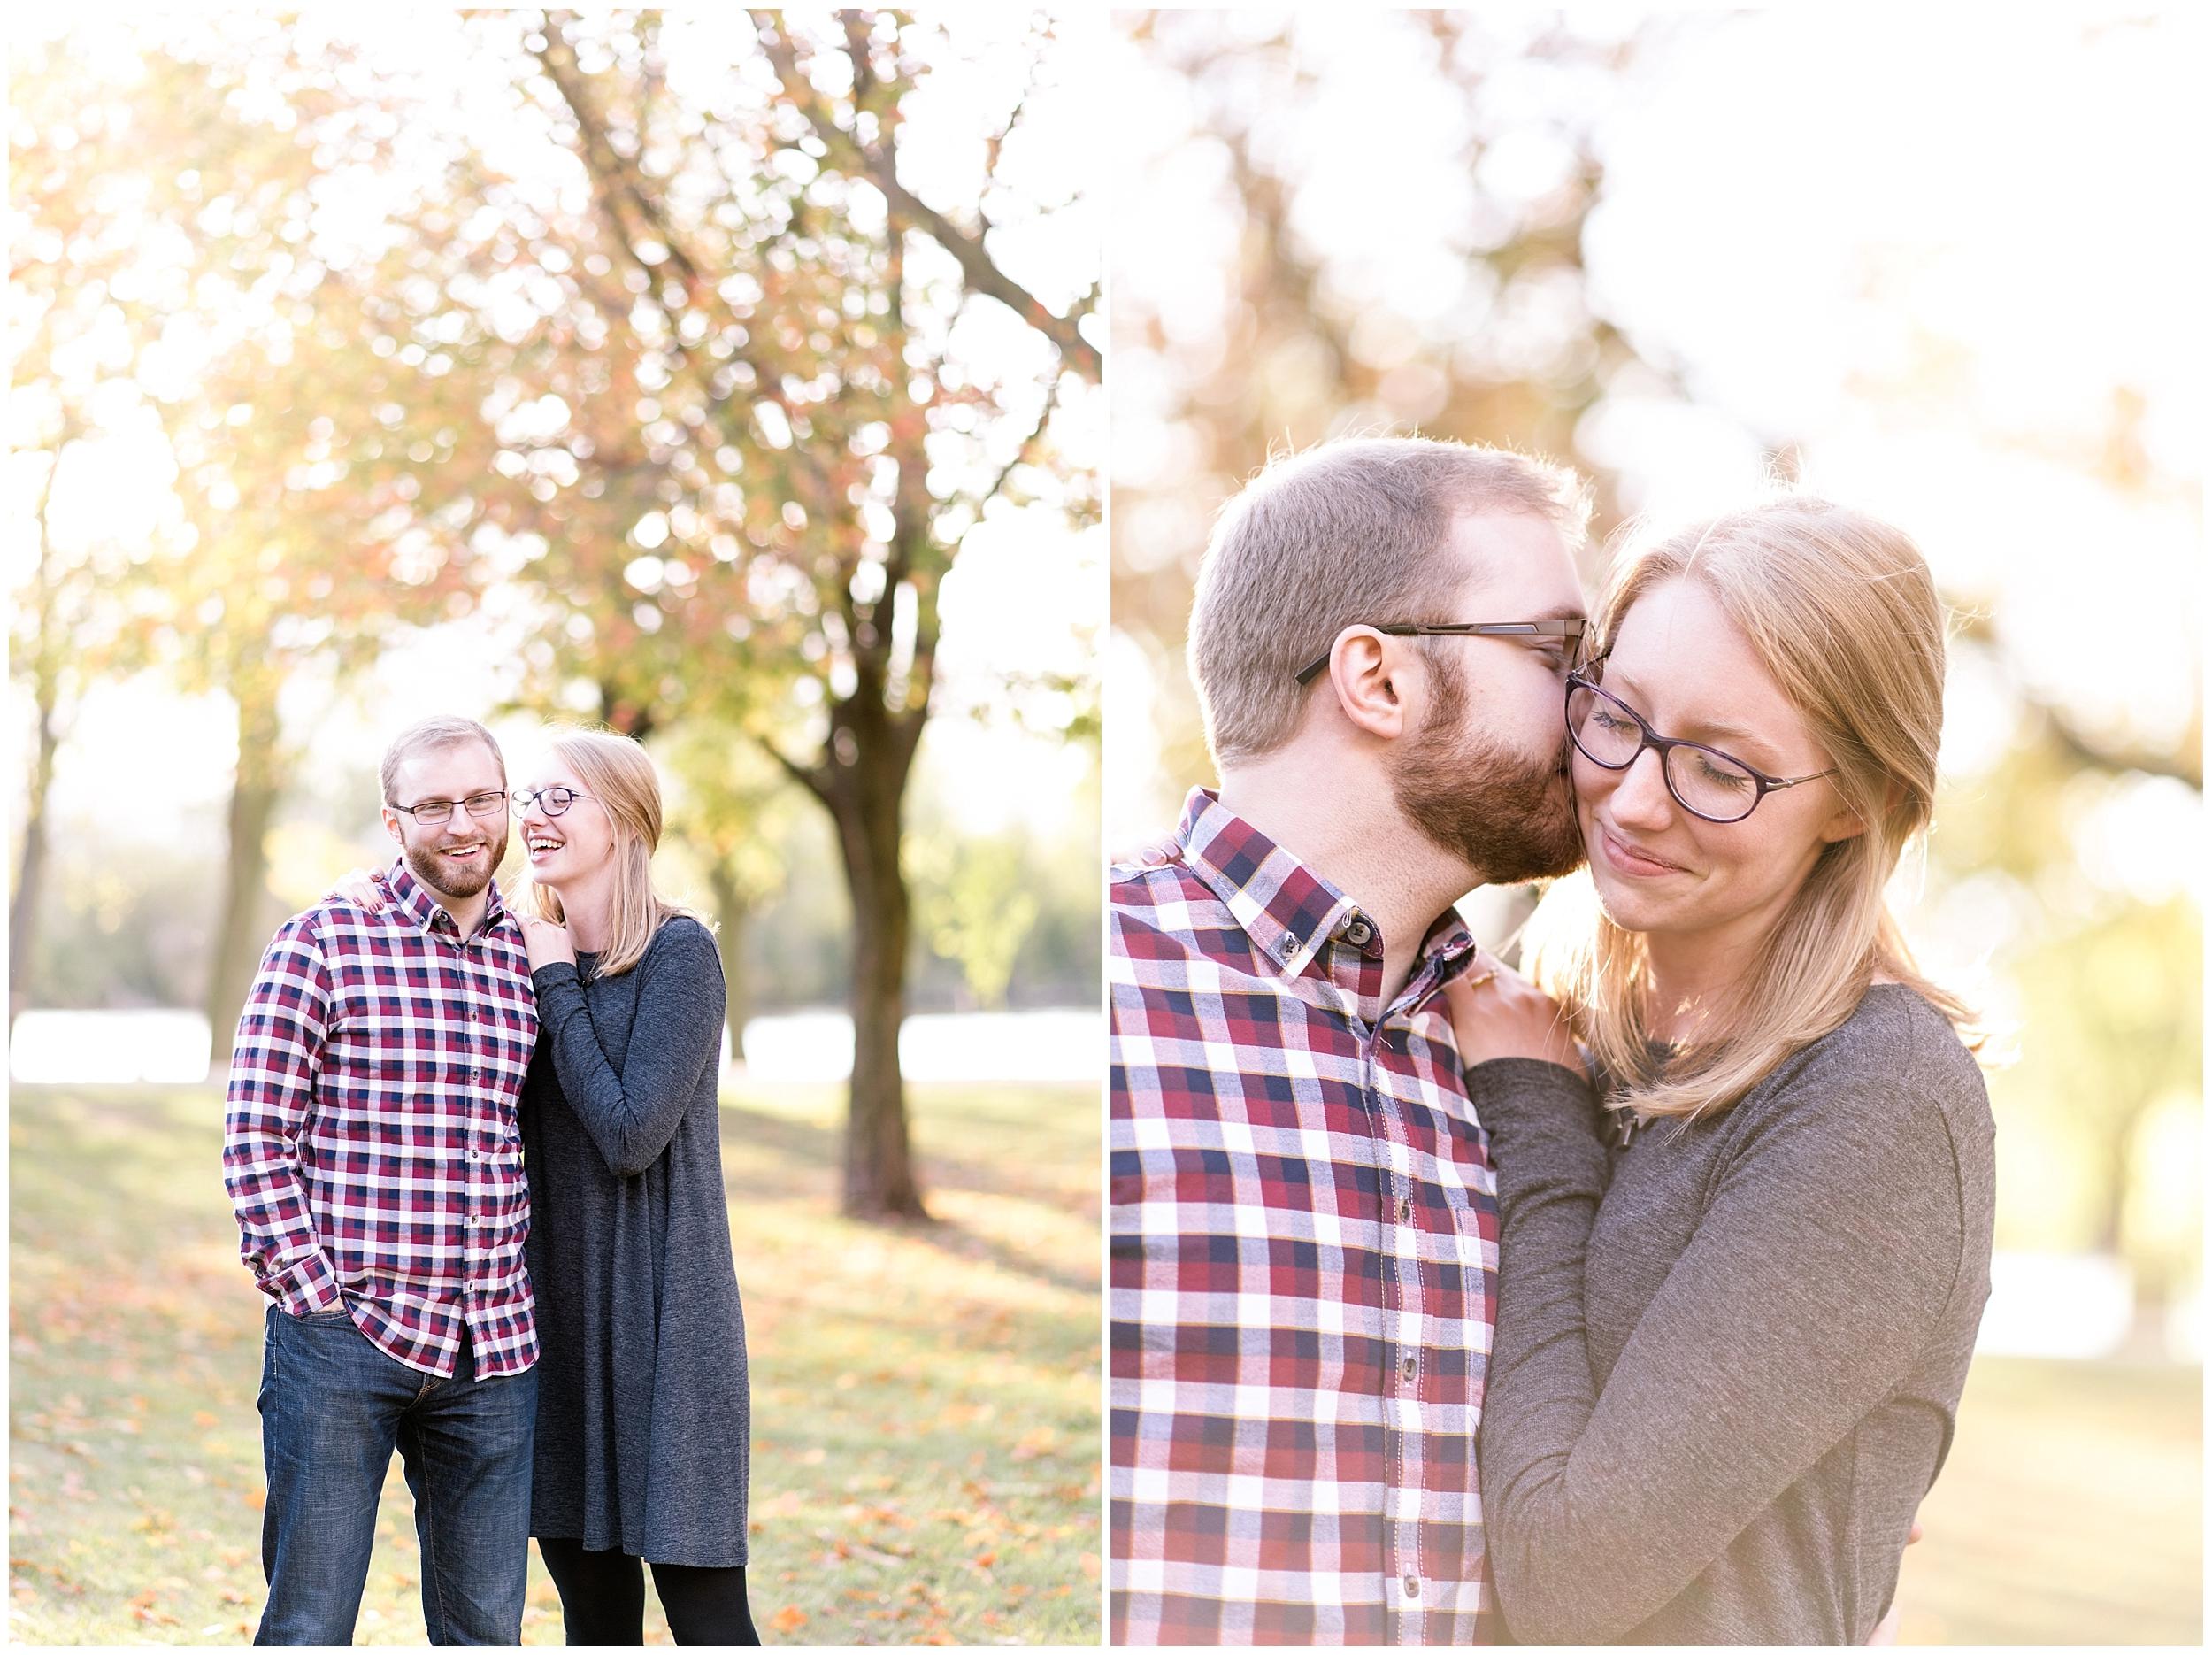 Weddings_by_Raisa_Photography_Grand_Rapids_October_Fall_Engagement_Milwaukee_Wisconsin_Photographer_0006.jpg